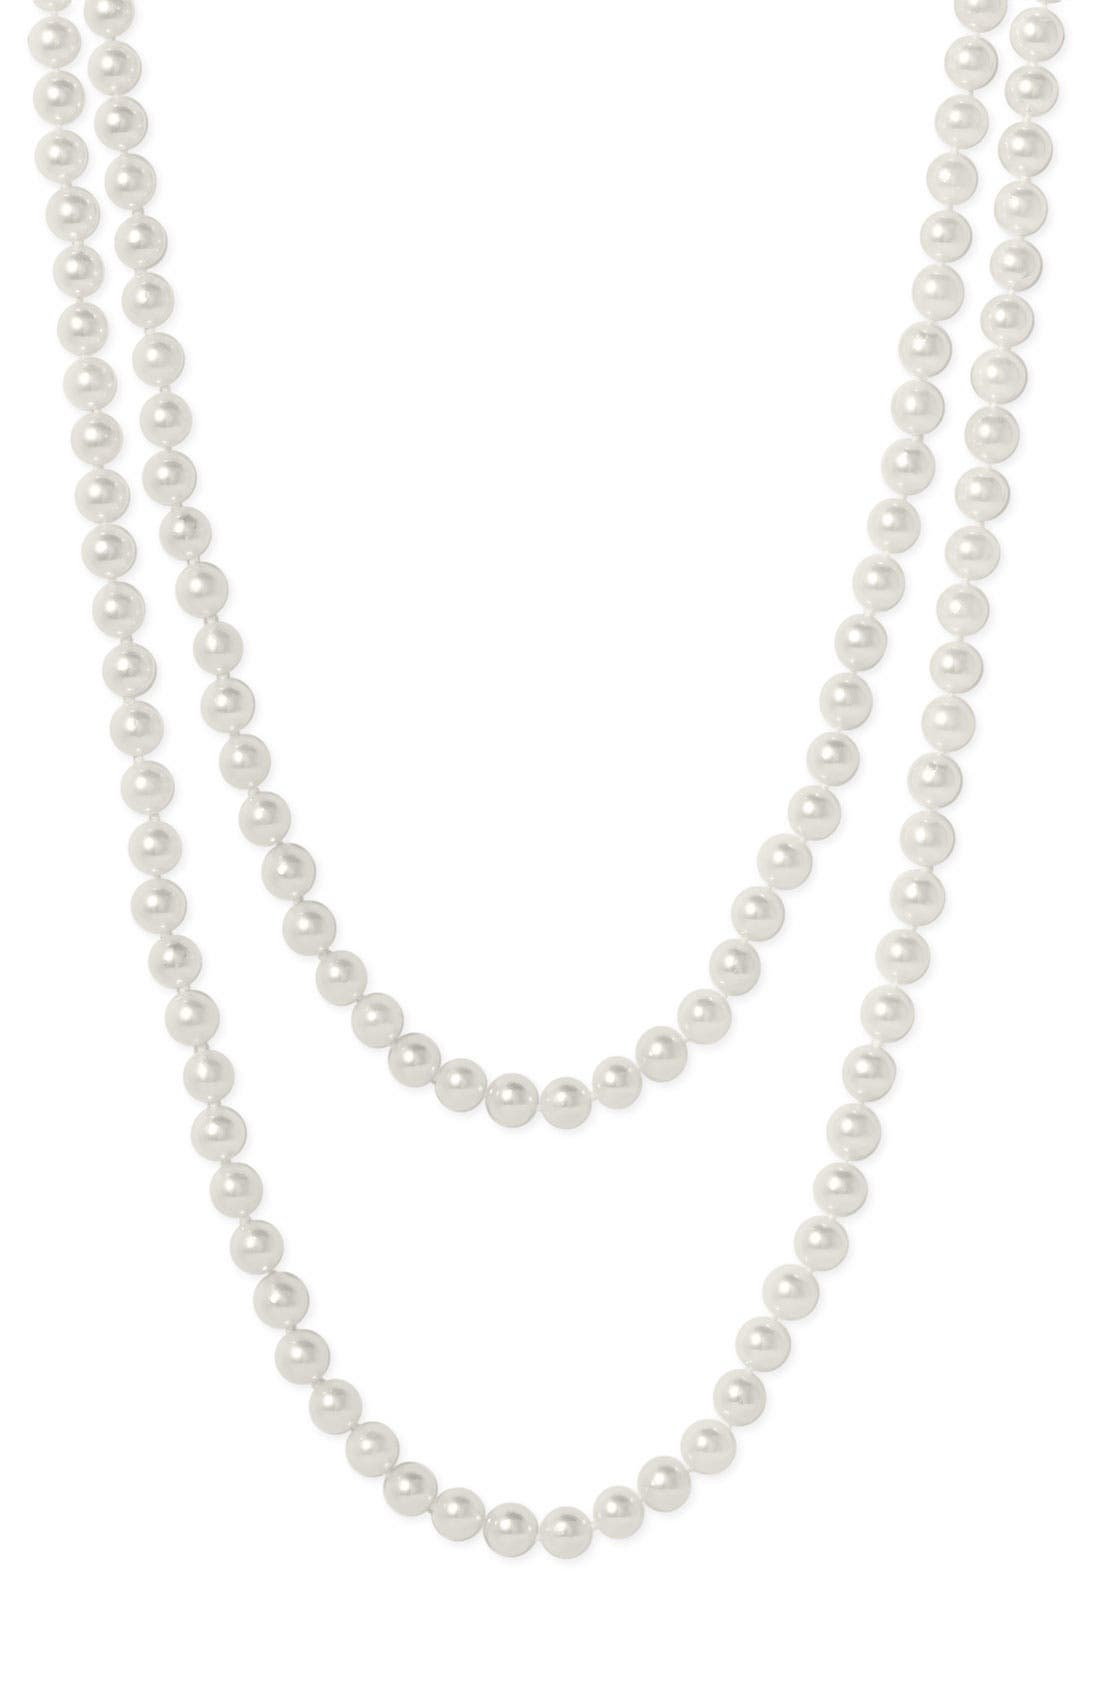 Alternate Image 1 Selected - Mastoloni Akoya Baroque 7mm Pearl Long Strand Necklace